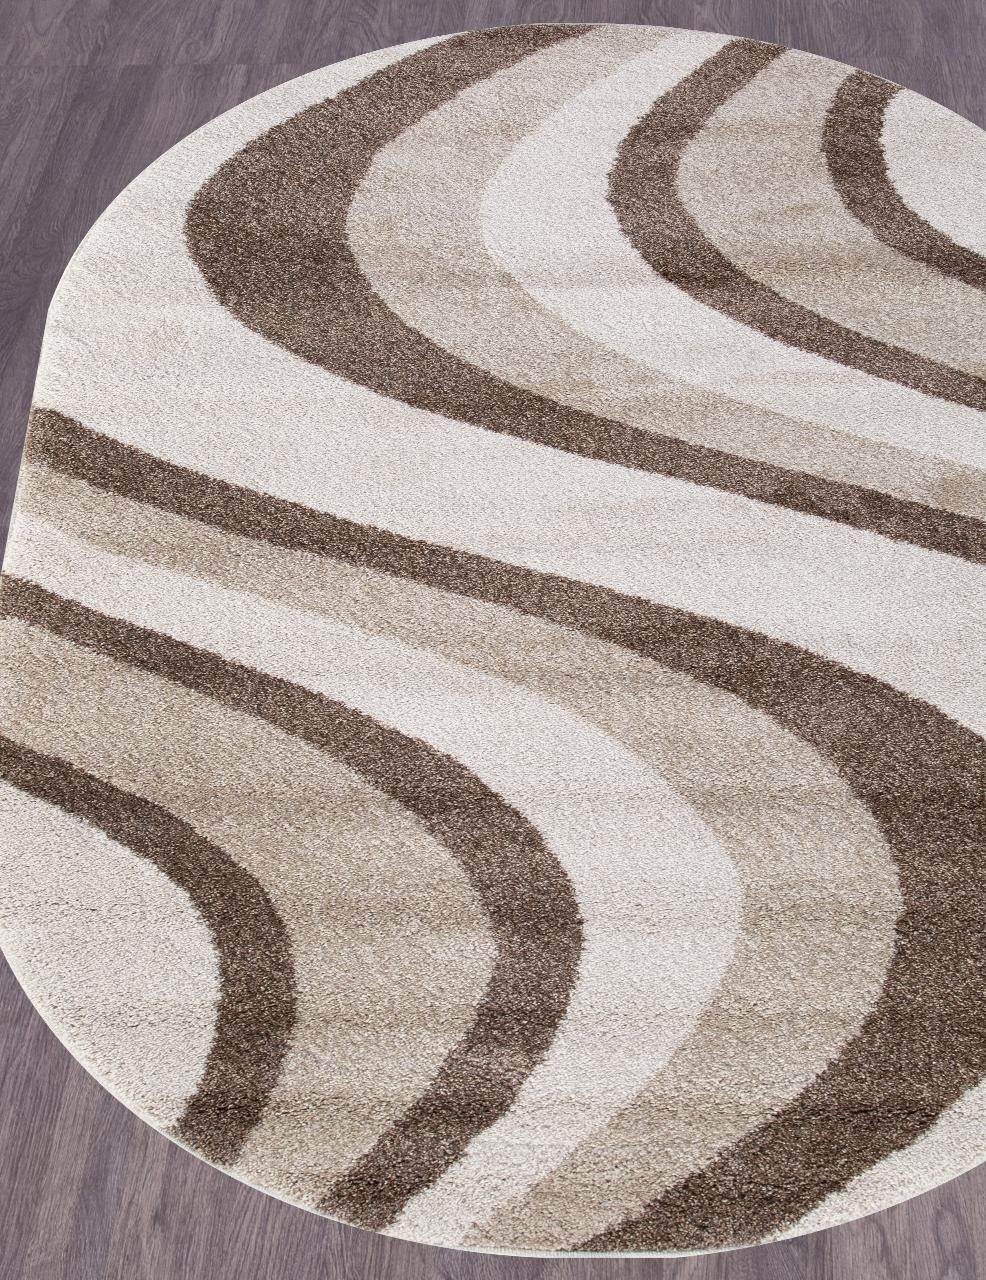 Ковер t617 - CREAM - Овал - коллекция PLATINUM